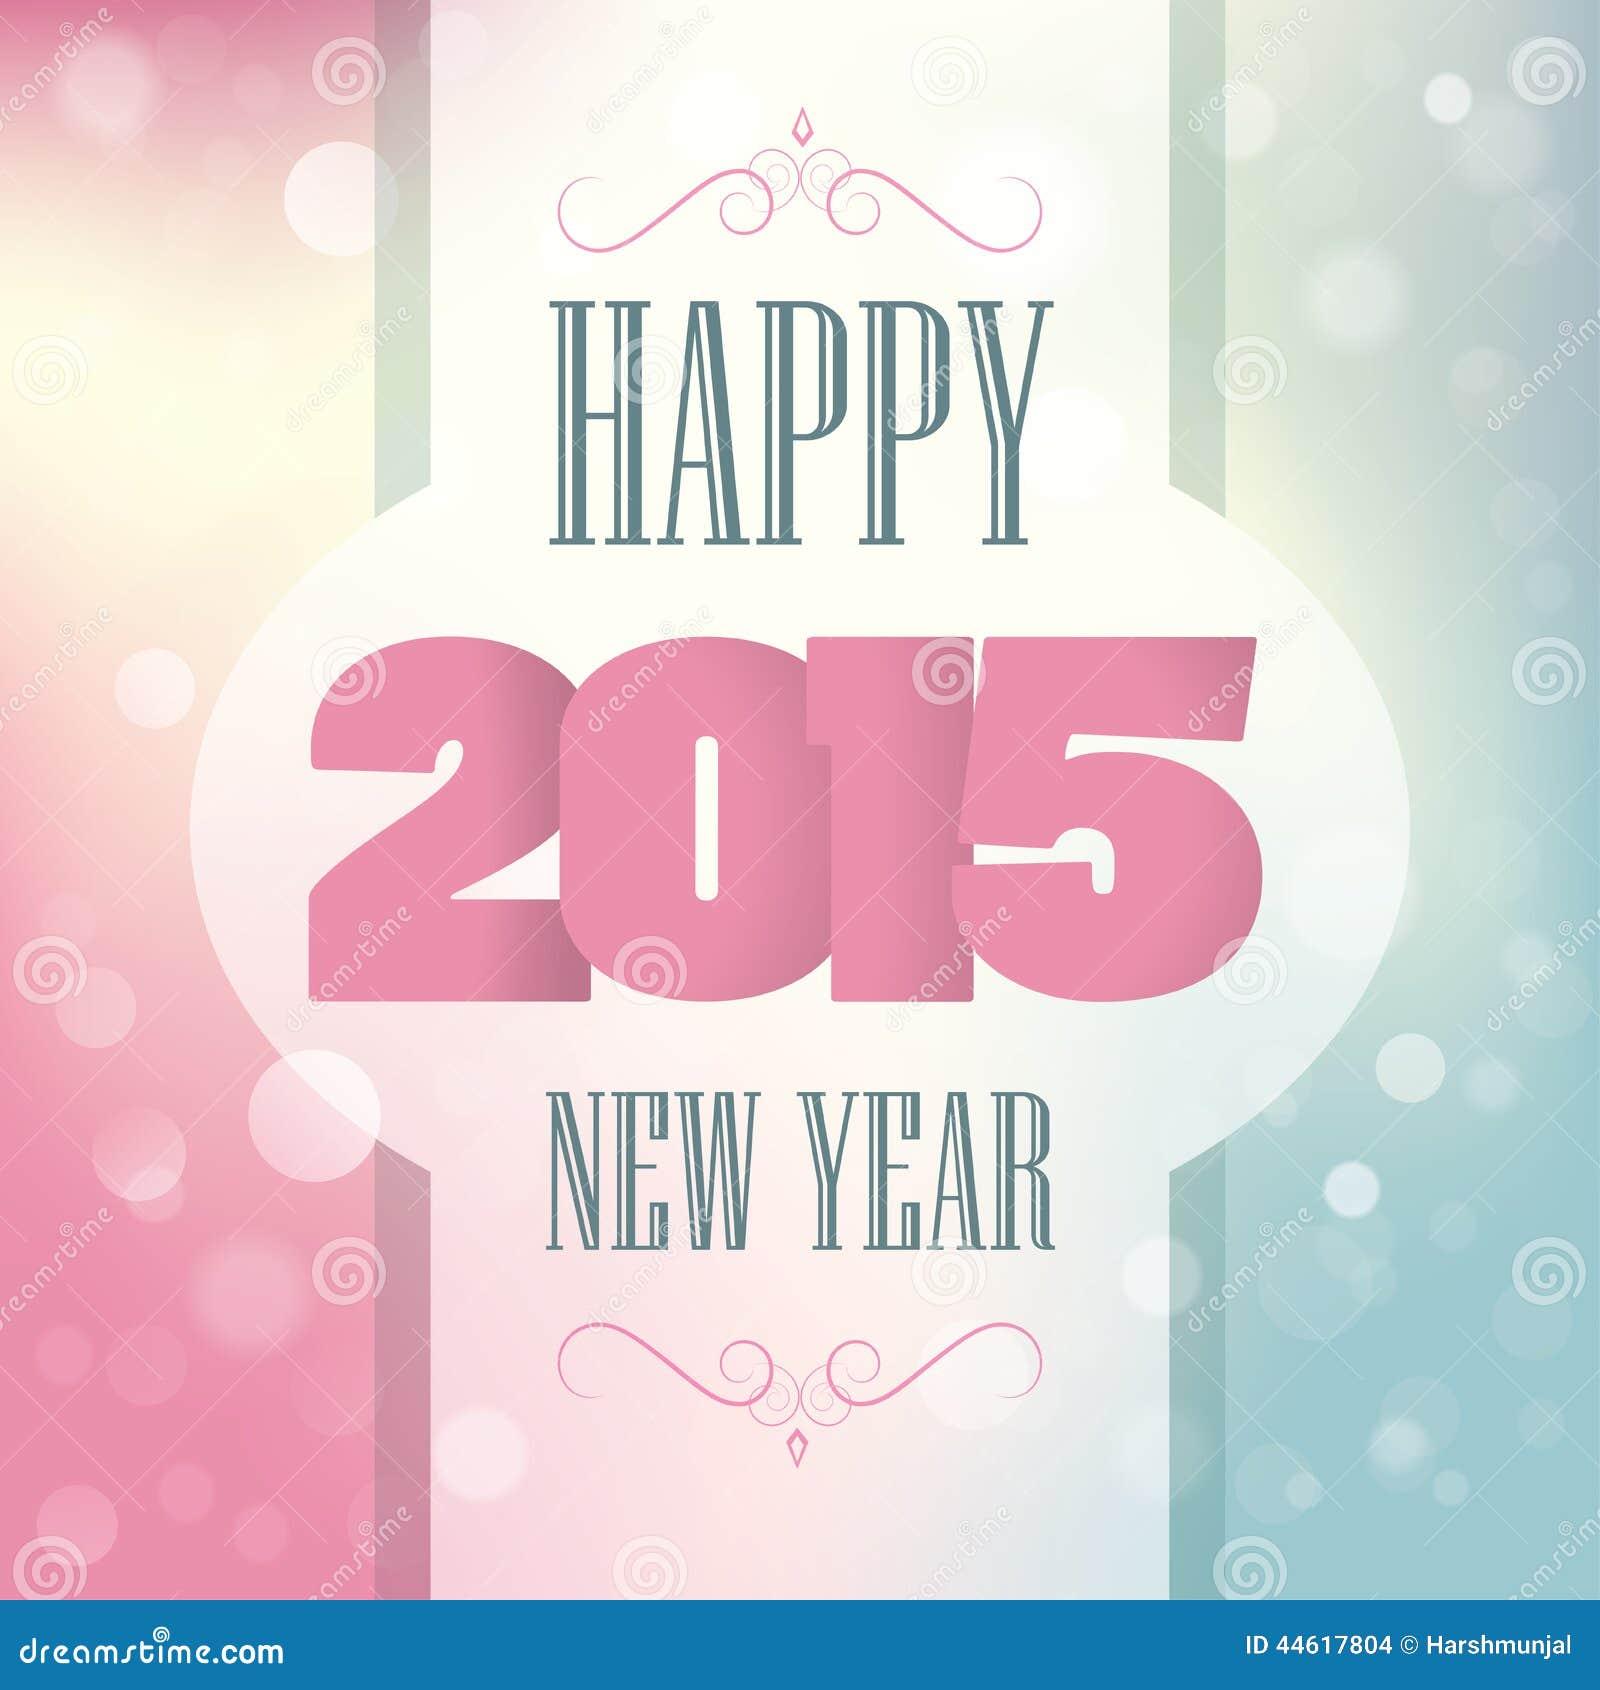 happy new year 2015 stock illustration image 44617804